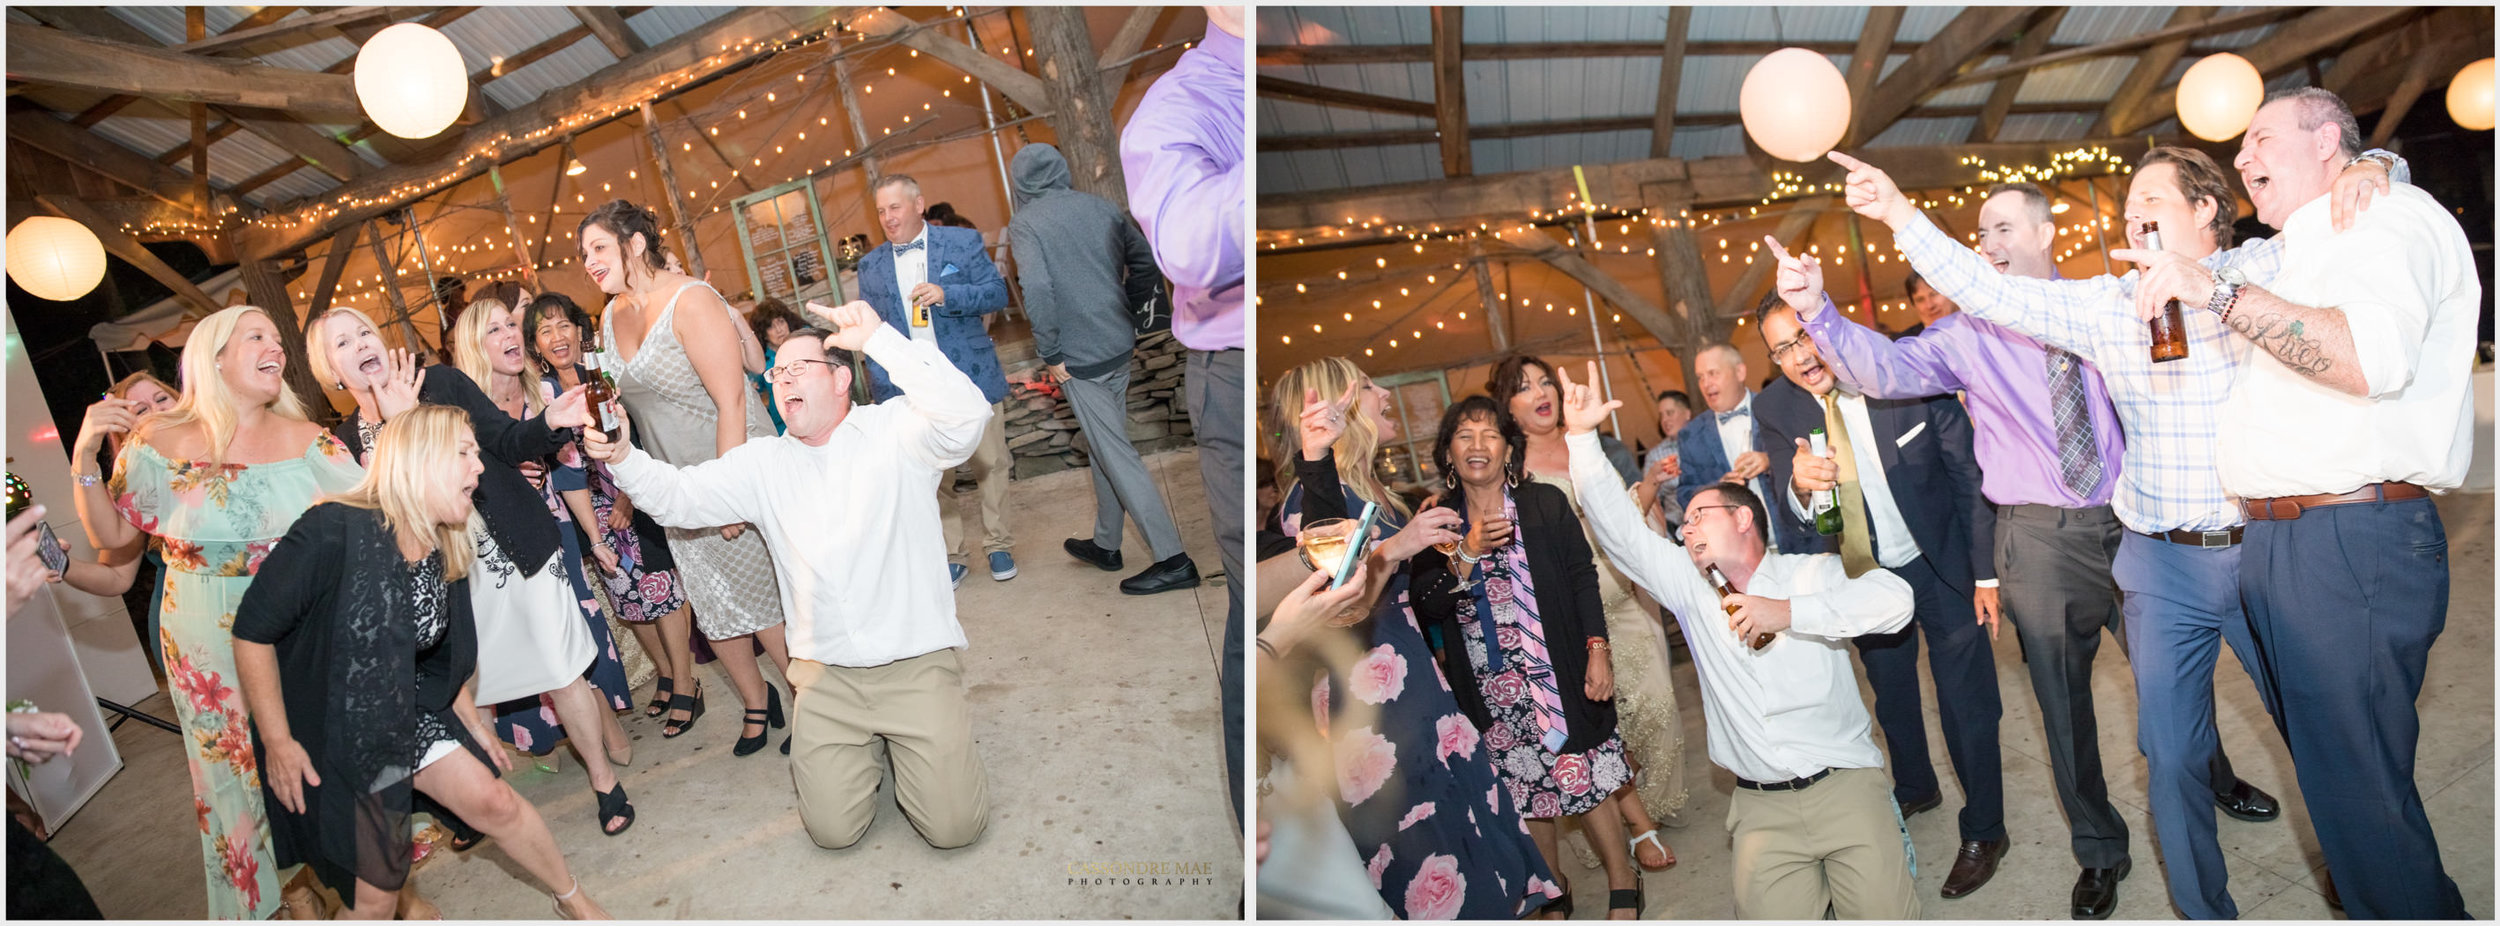 Cassondre Mae Photography Emmerich Tree Farm Wedding 11.jpg